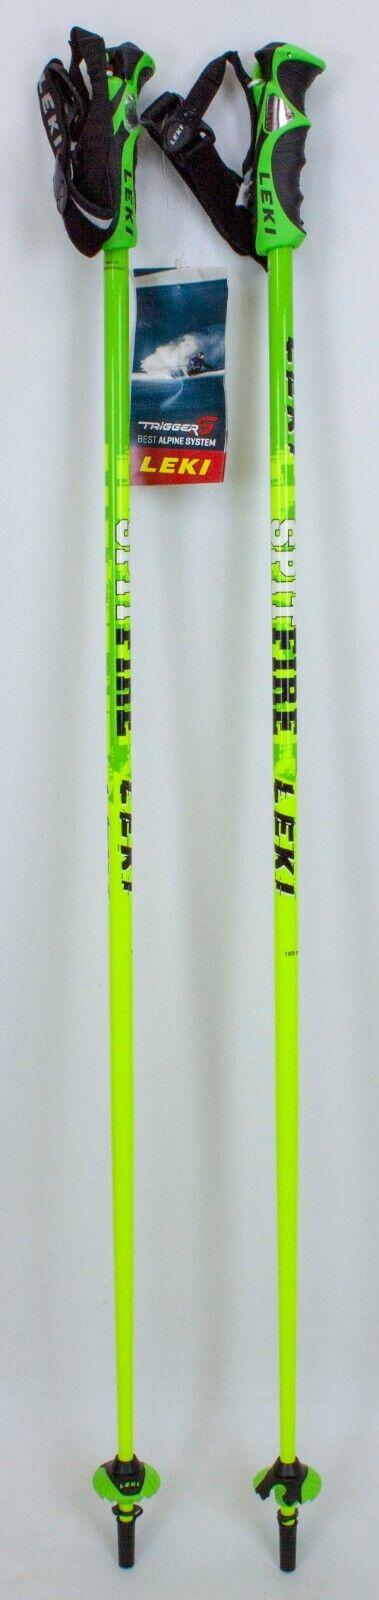 "как выглядит NEW 130 LEKI Spitfire Trigger S Compatible Ski Poles 105CM 42"" Downhill Skiing фото"